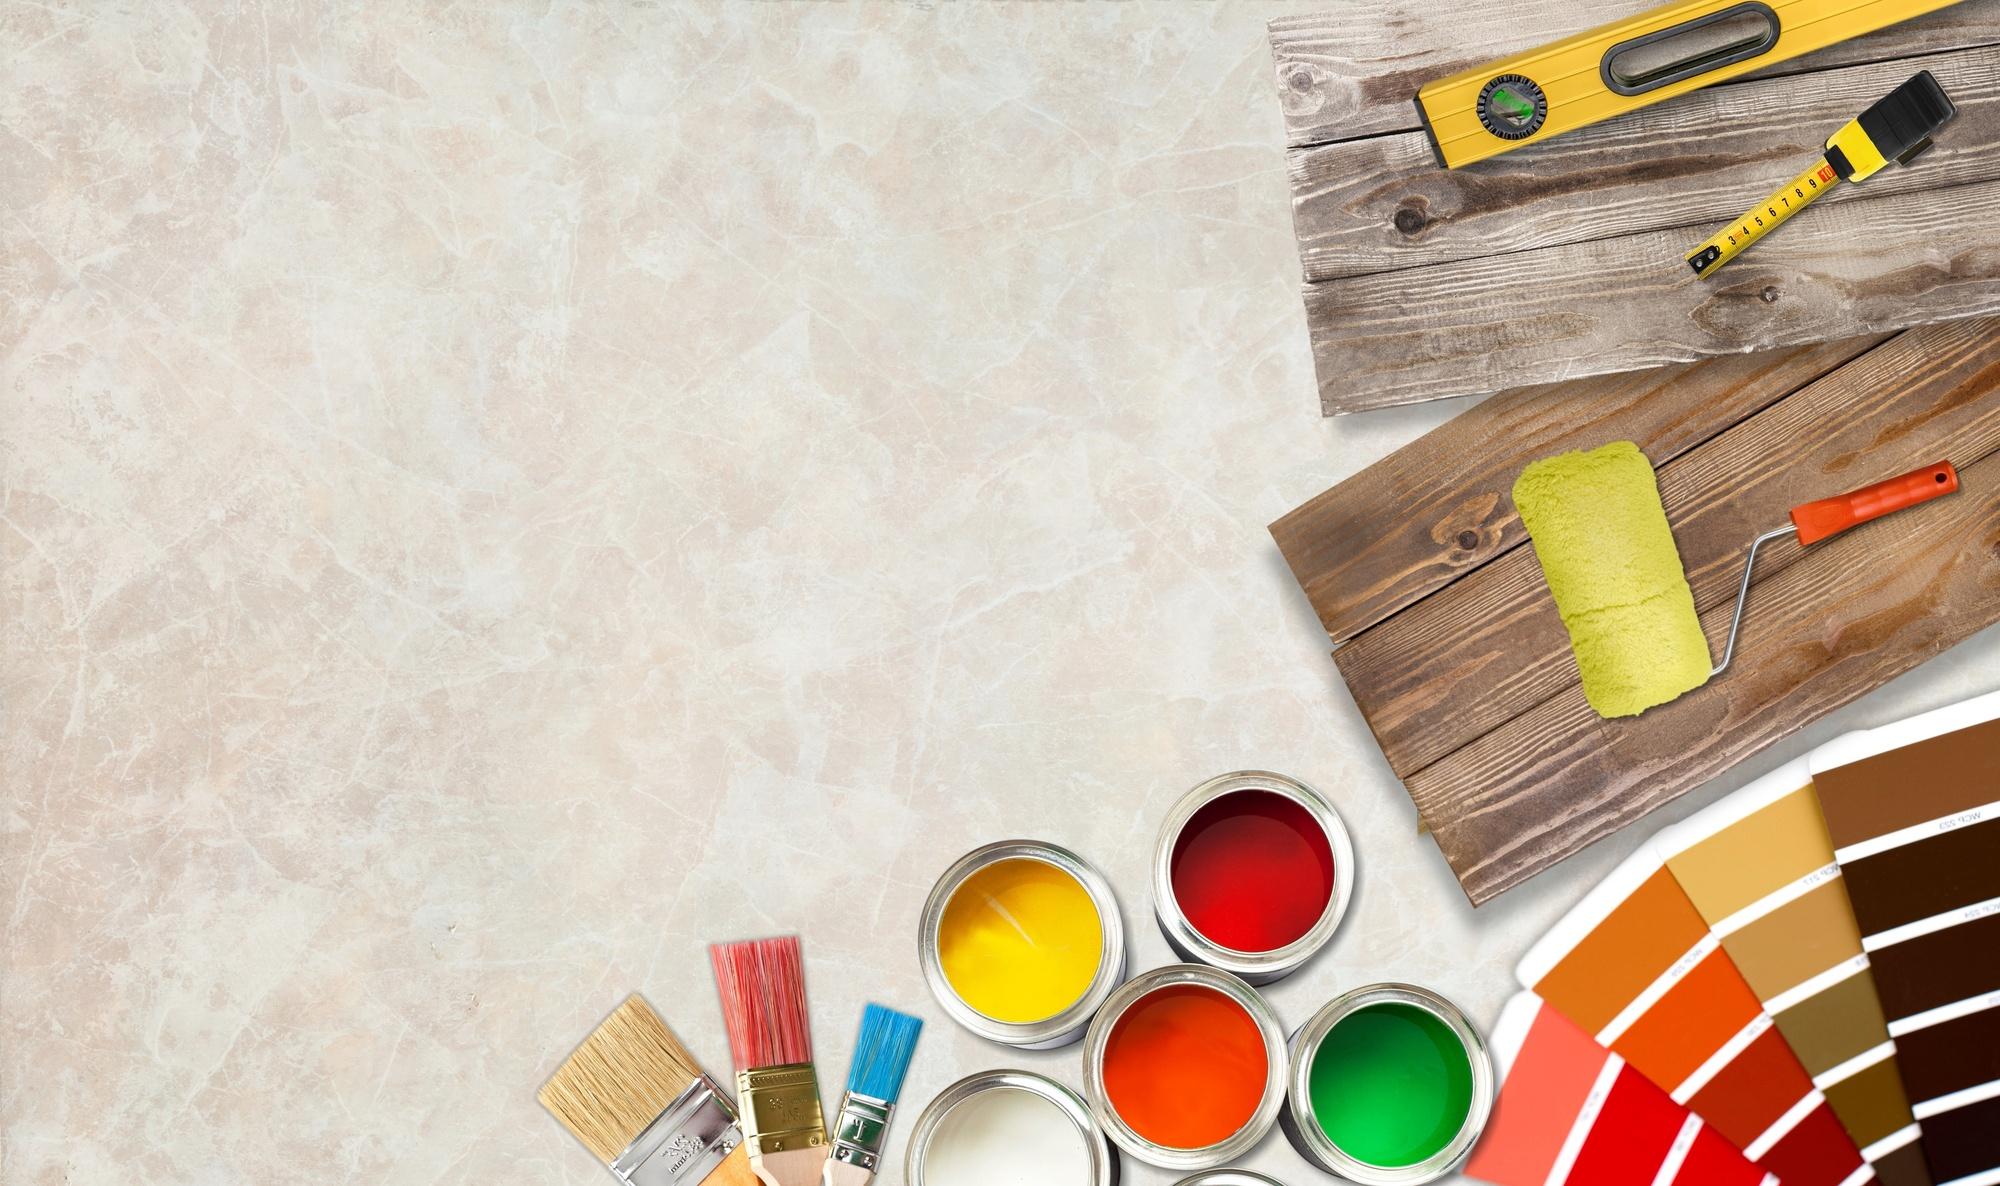 color me impressed 2018 39 s most popular interior paint colors. Black Bedroom Furniture Sets. Home Design Ideas